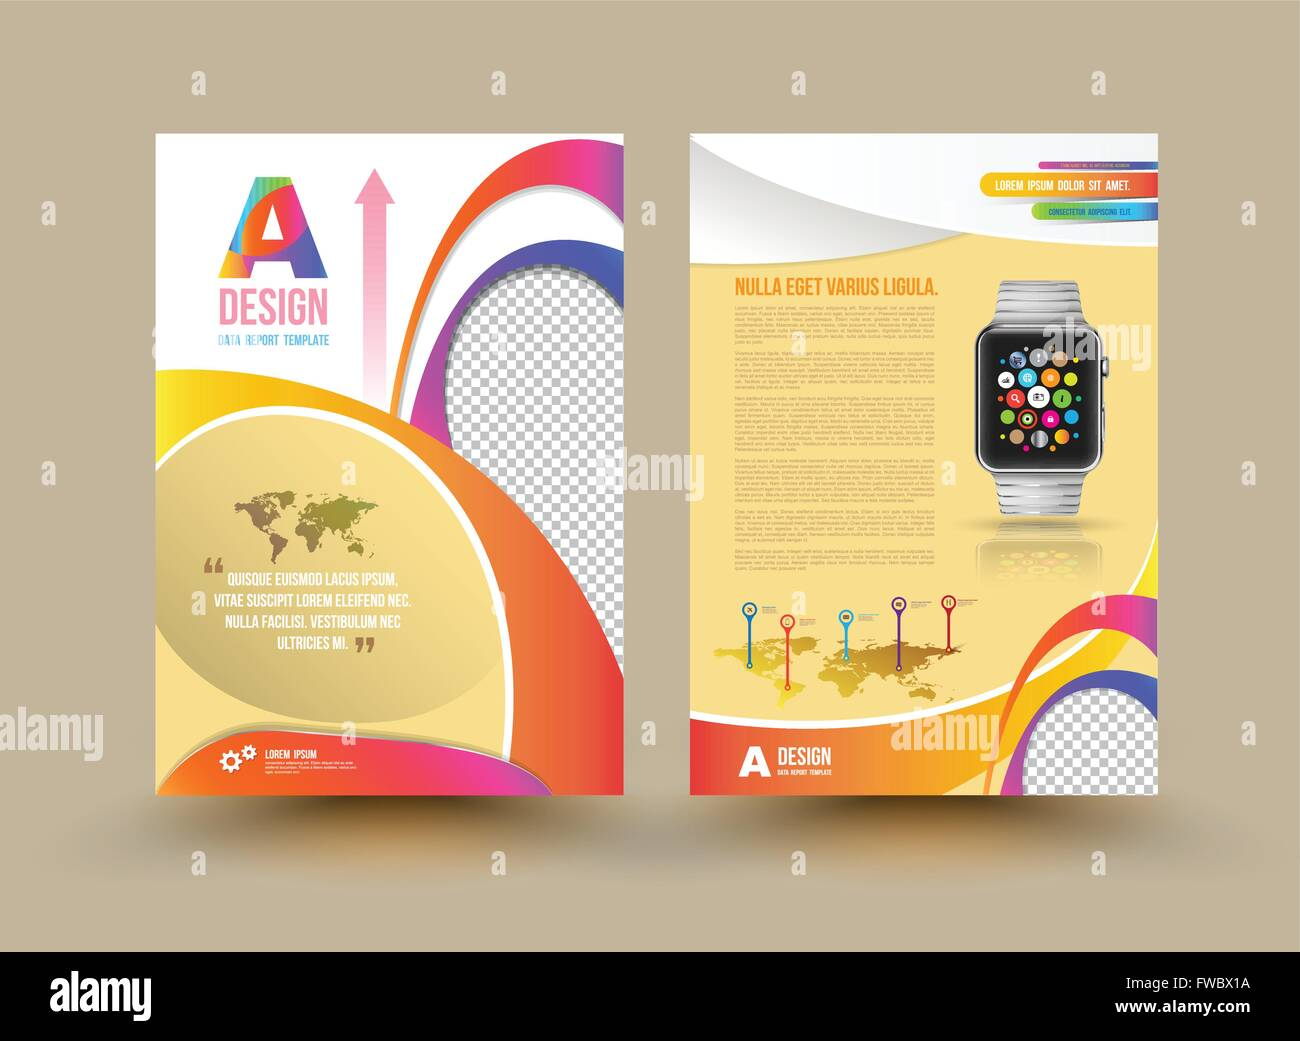 Vector Brochure Template Design With Smart Watch Business - Infographic brochure template